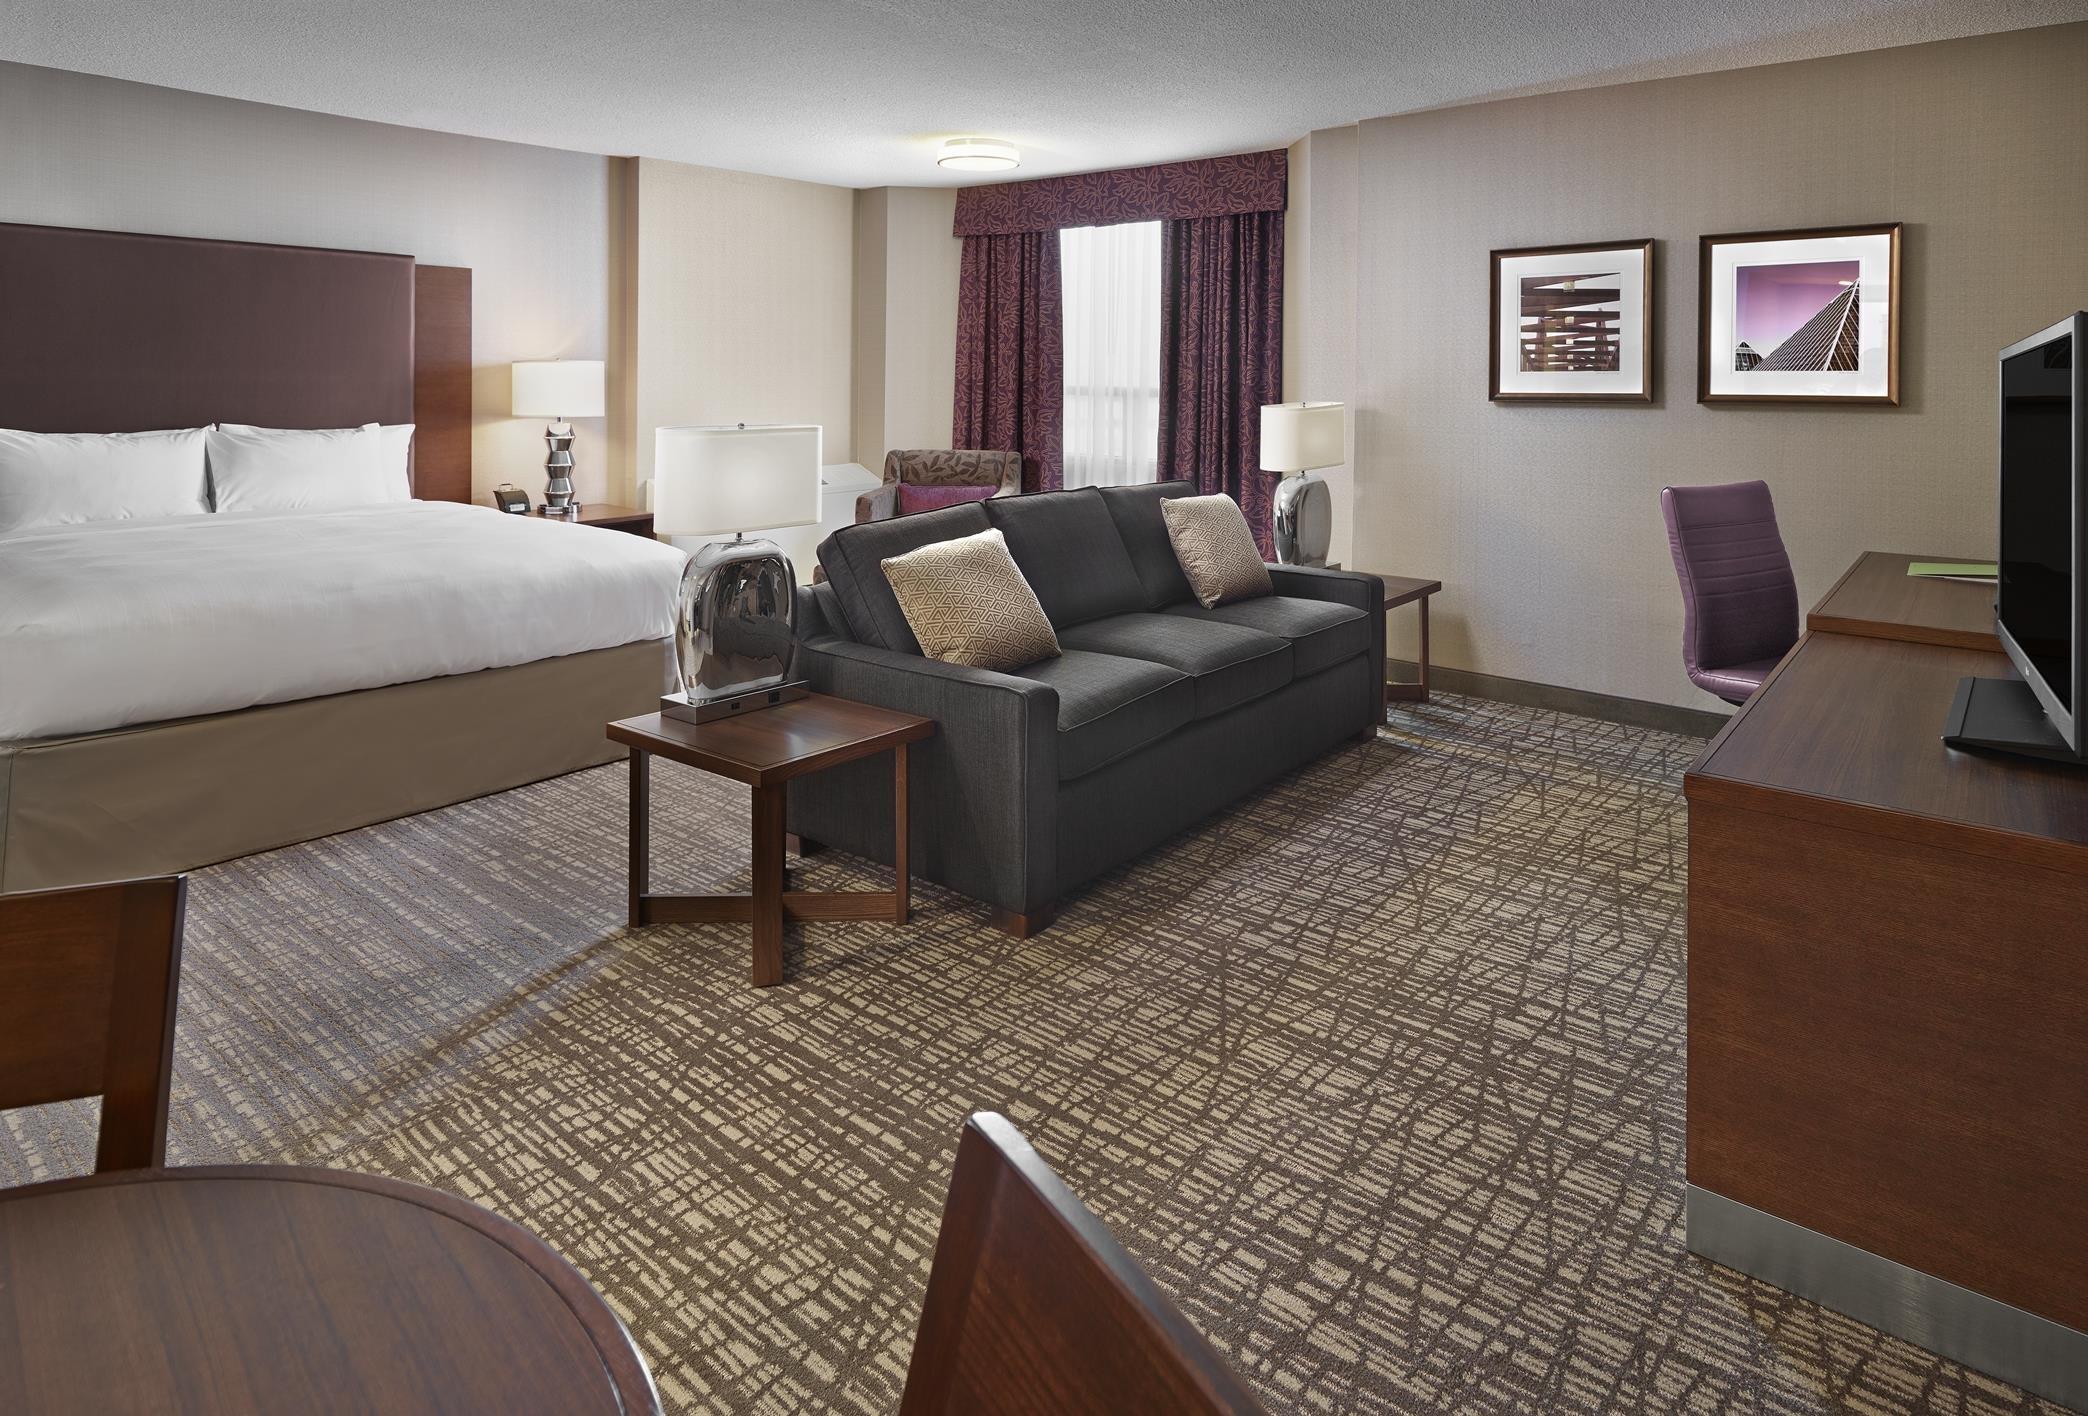 DoubleTree by Hilton Hotel West Edmonton in Edmonton: King Junior Suite